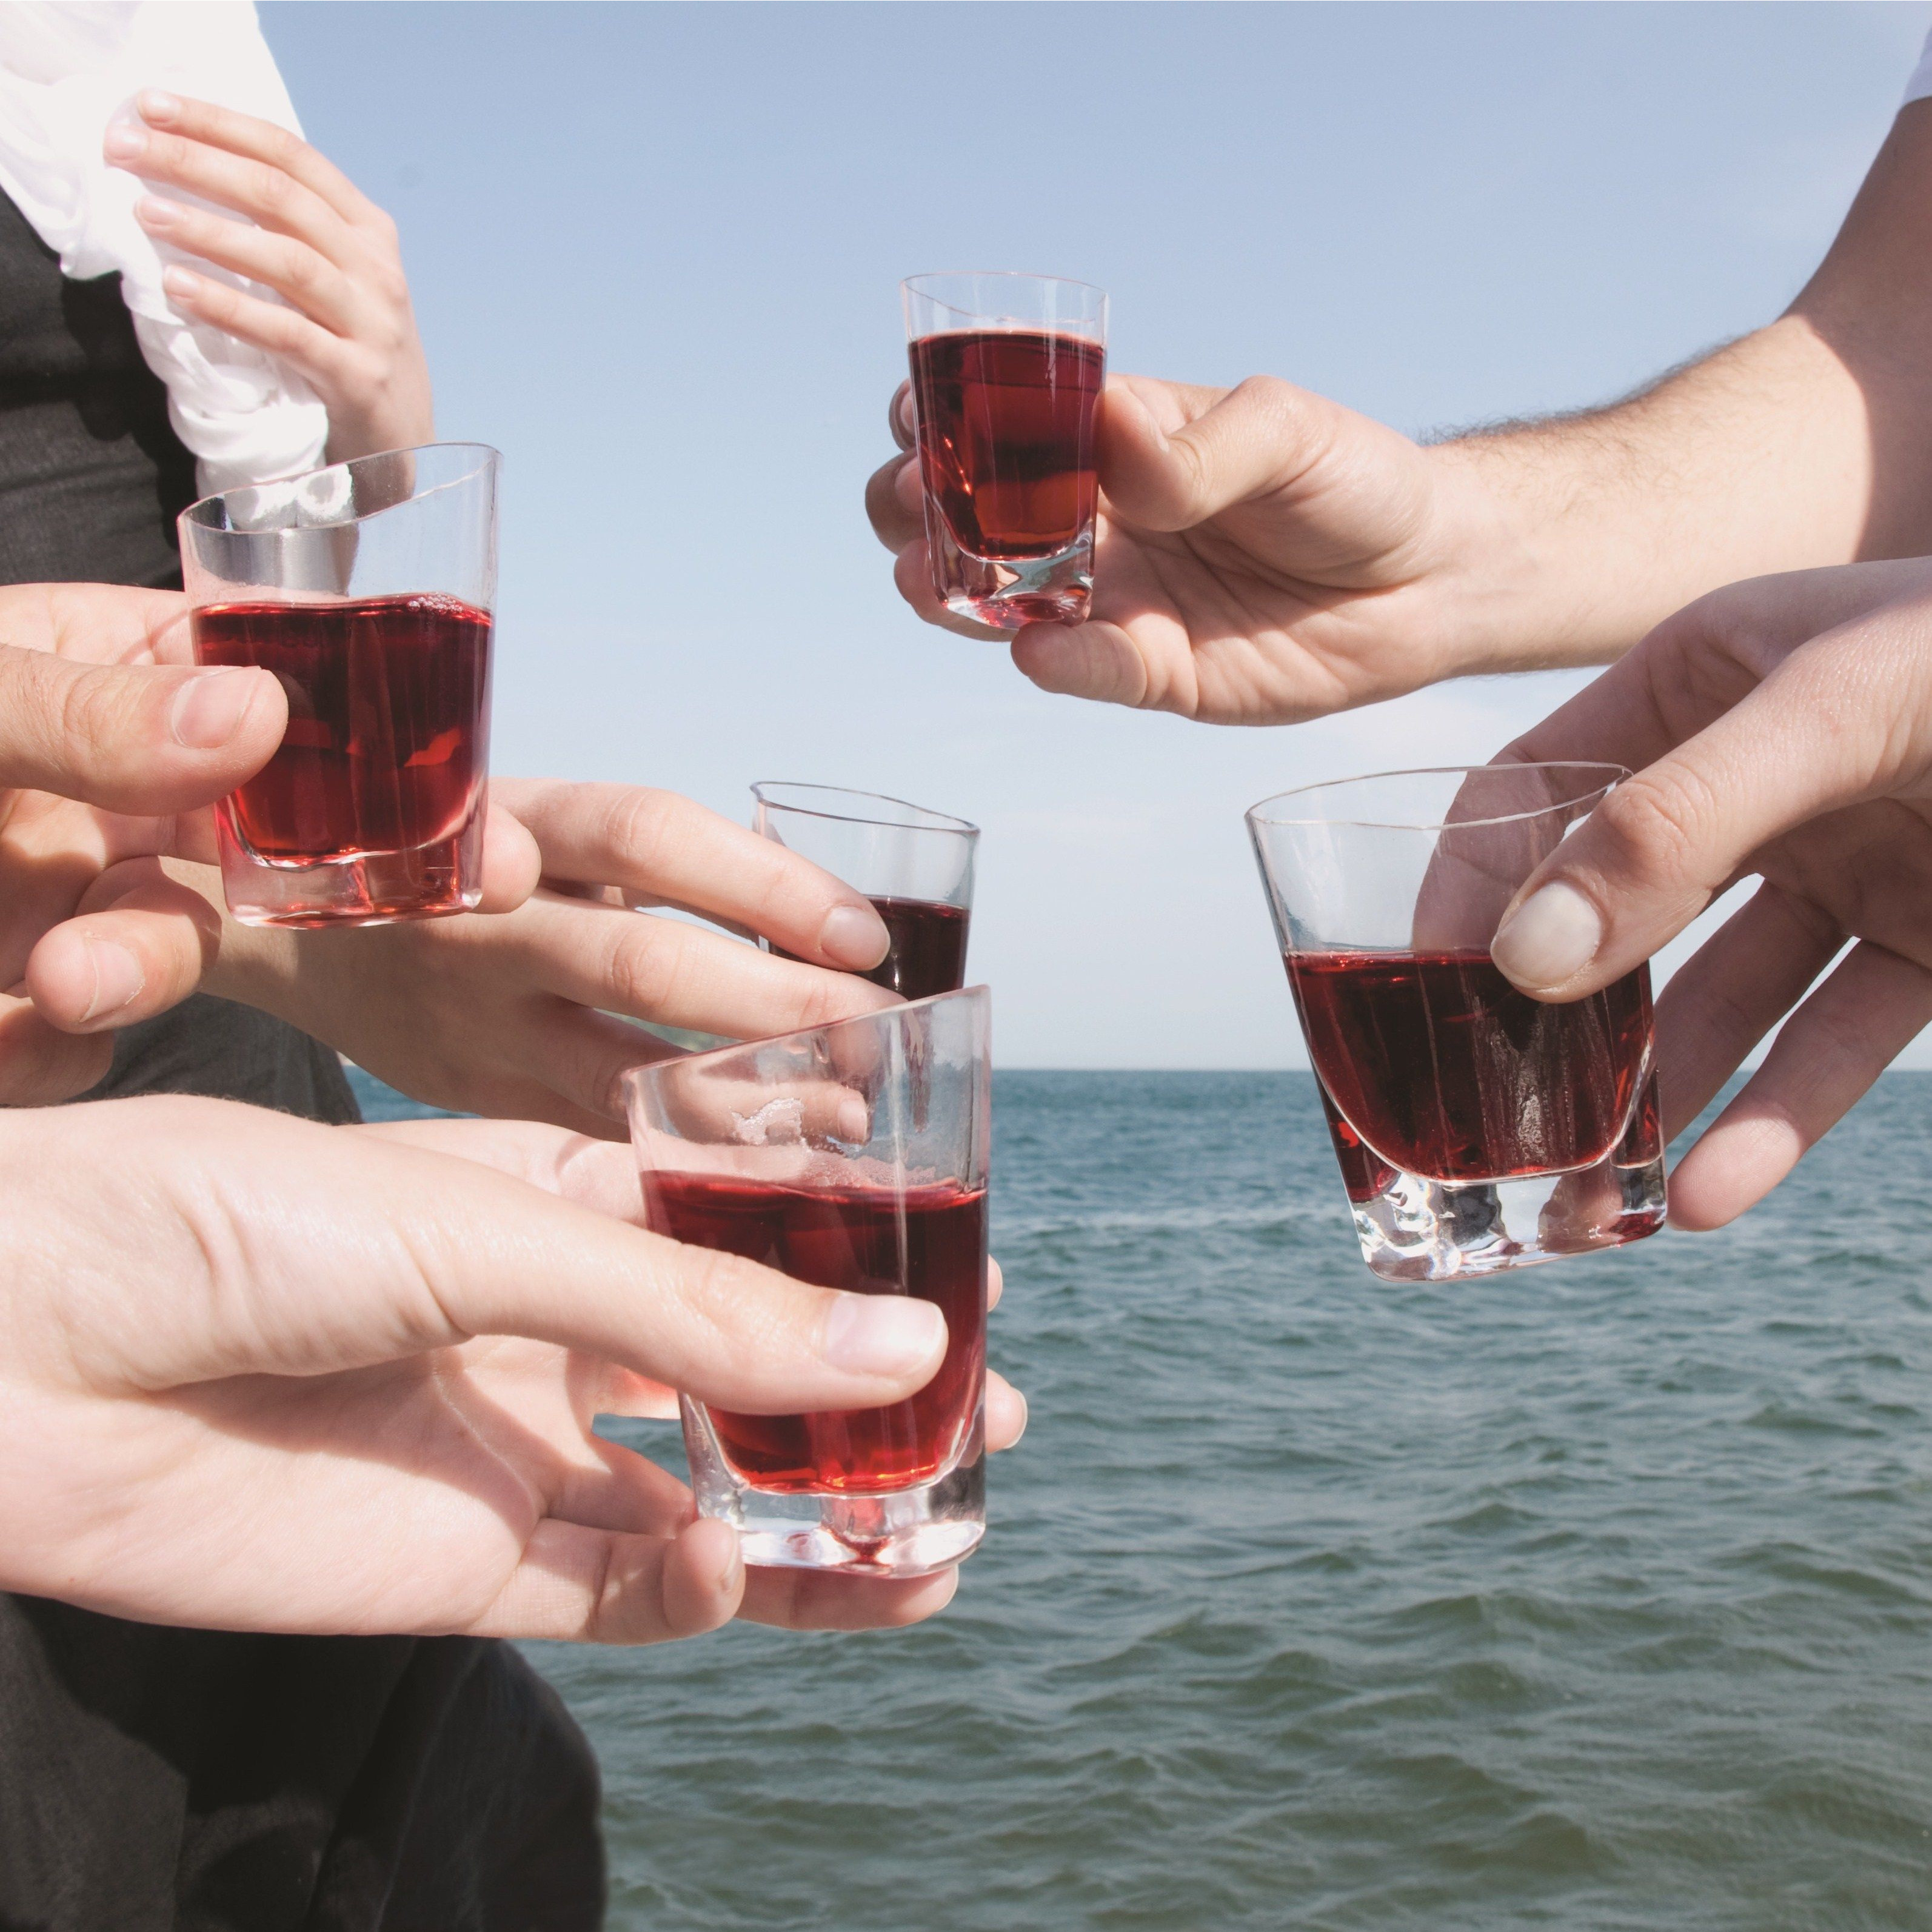 Set of 4 Happycell Liquor Glasses